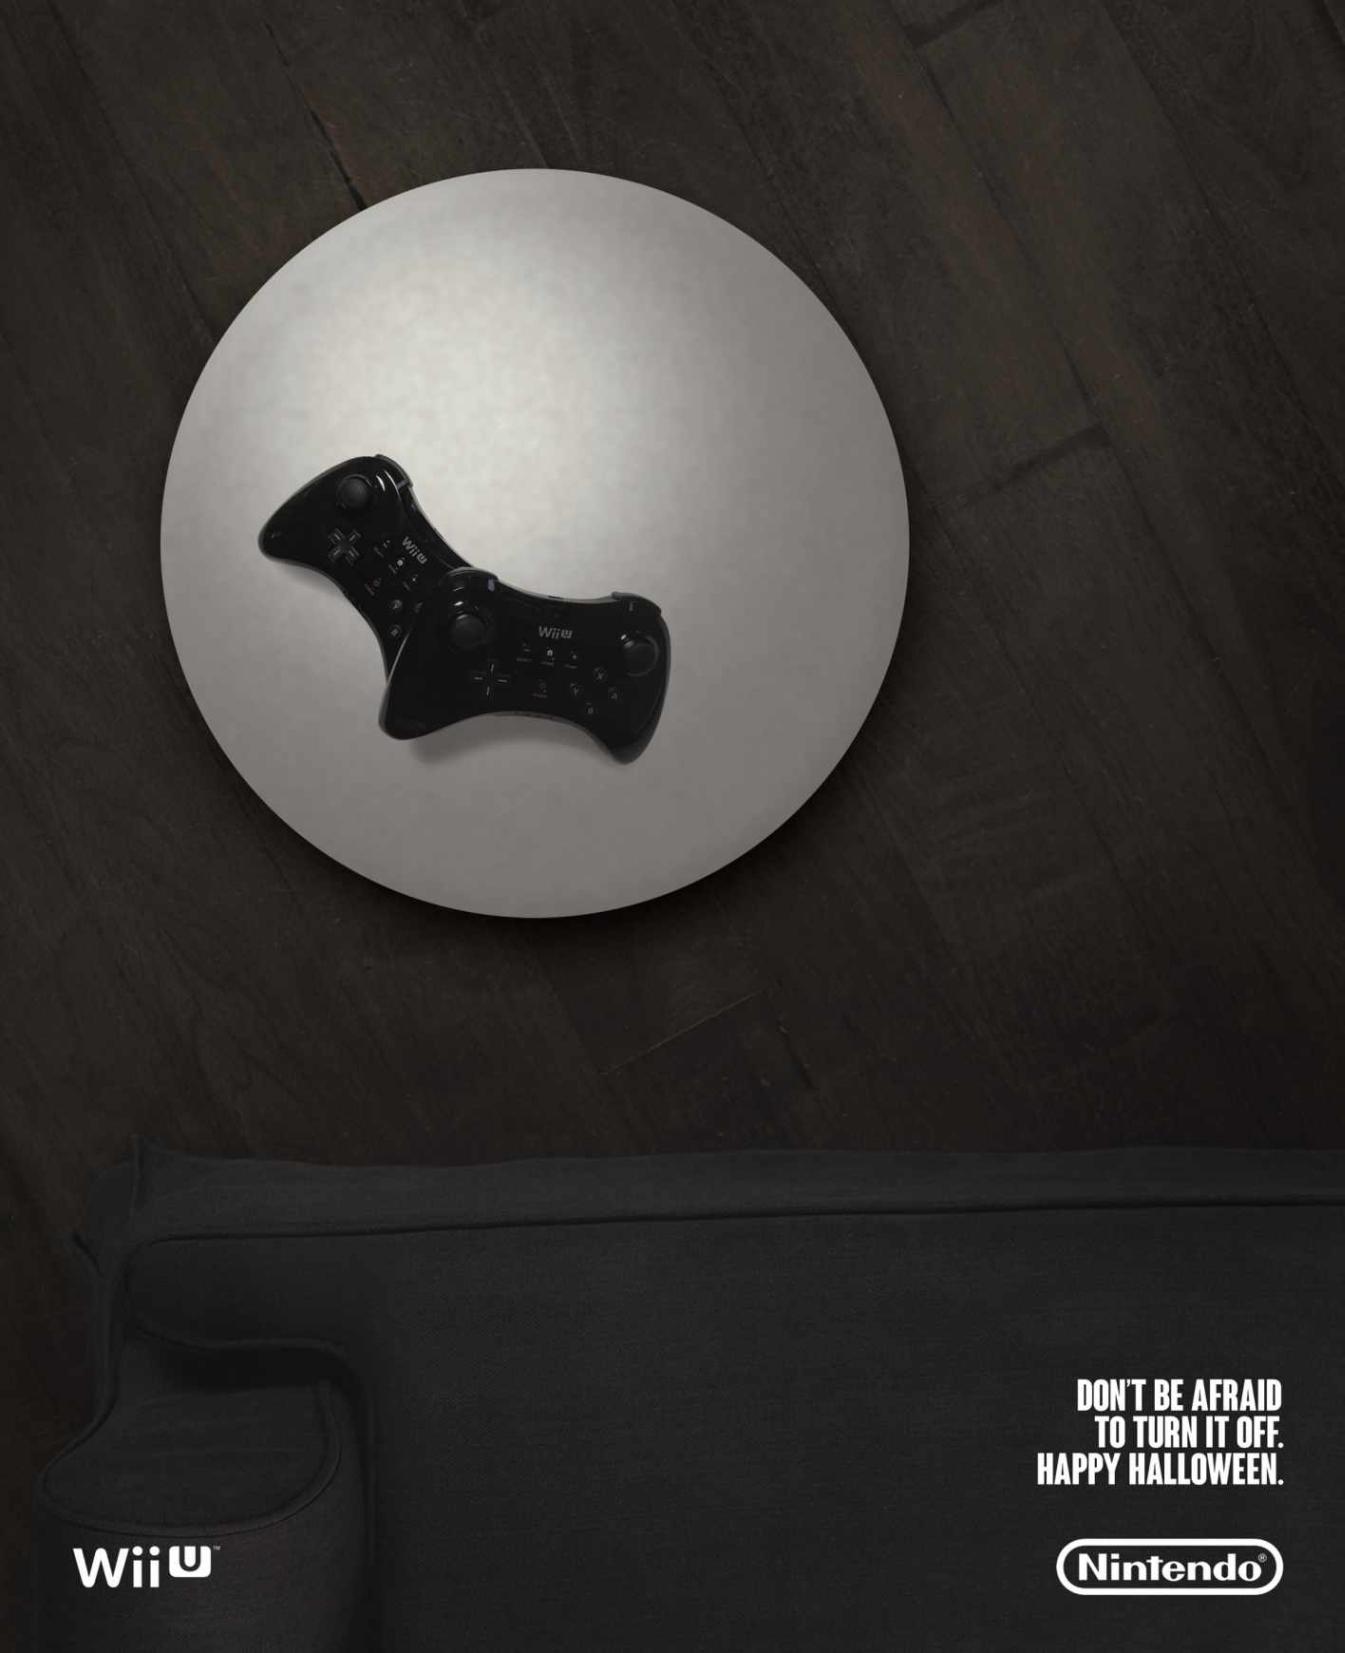 Halloween Creative Ads.Nintendo Halloween Ad Creative Ads And More